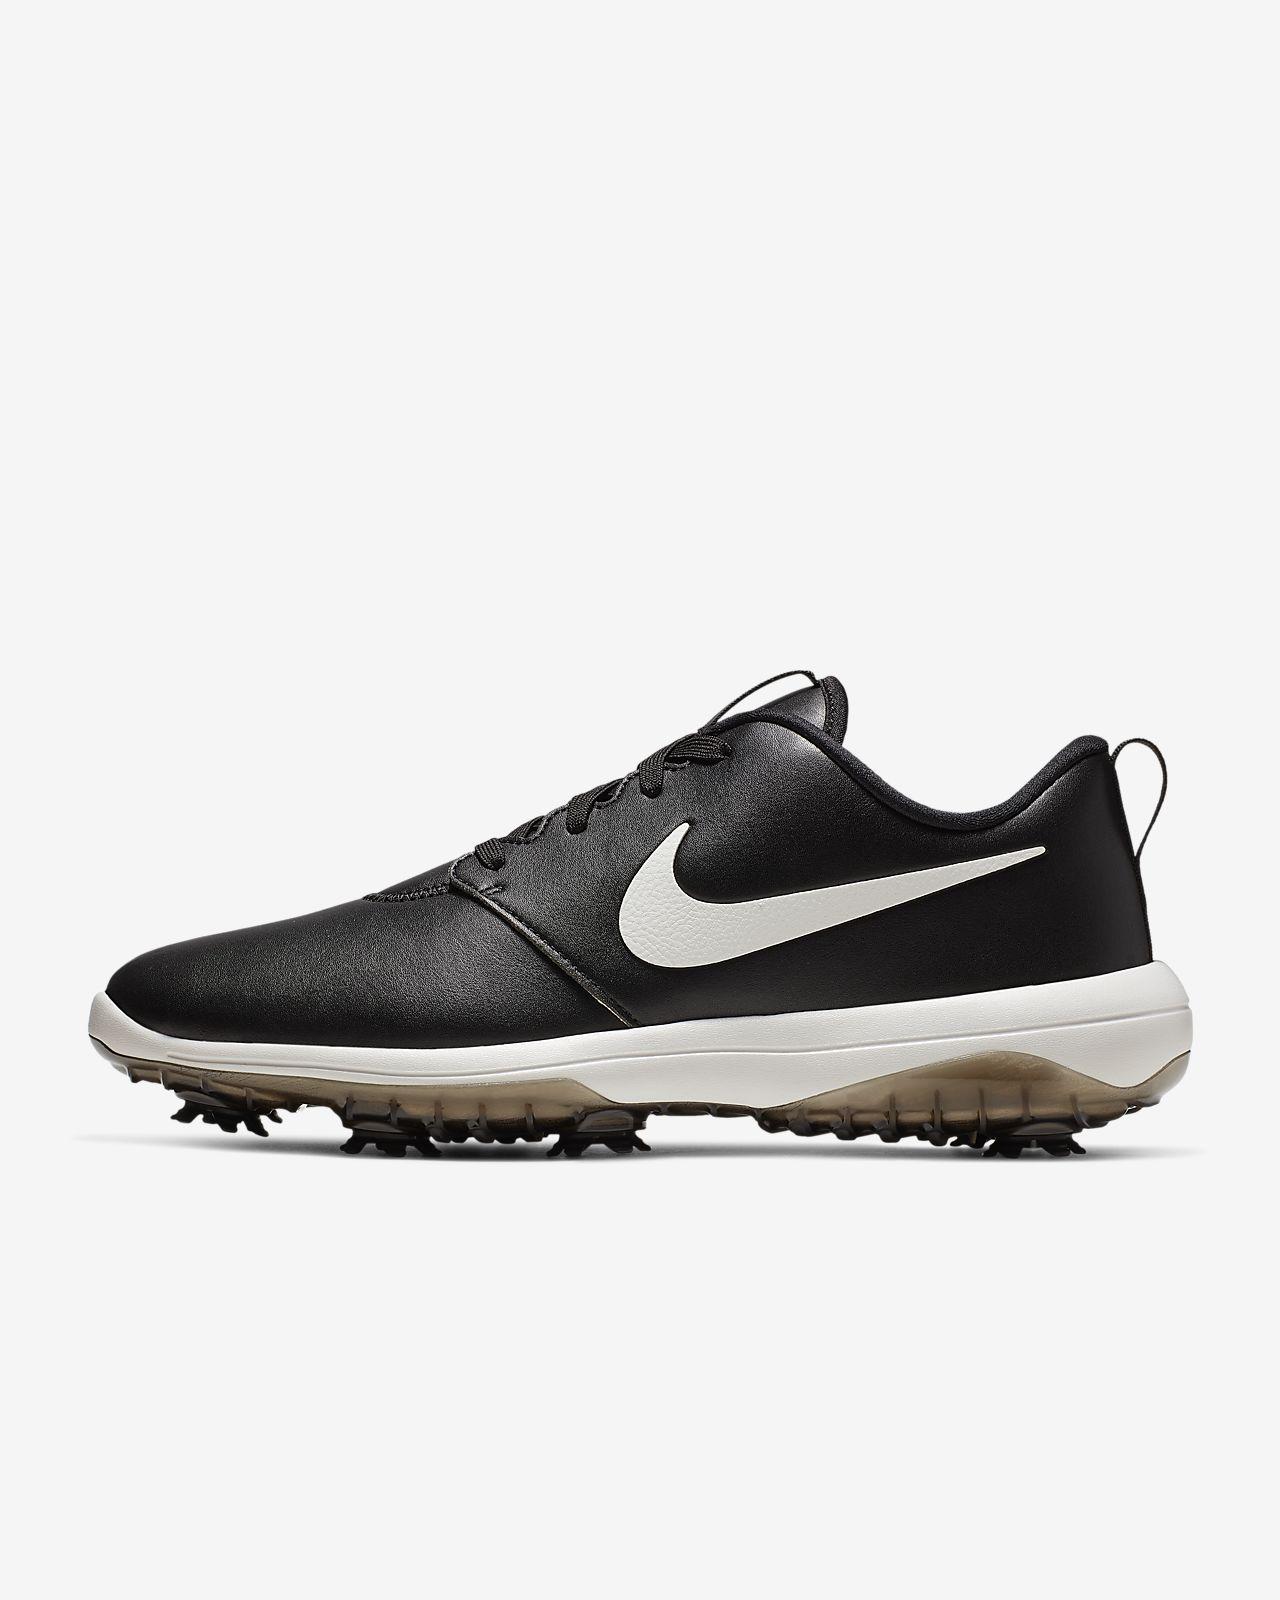 Pánská golfová bota Nike Roshe G Tour. Nike.com CZ 03921c71a59